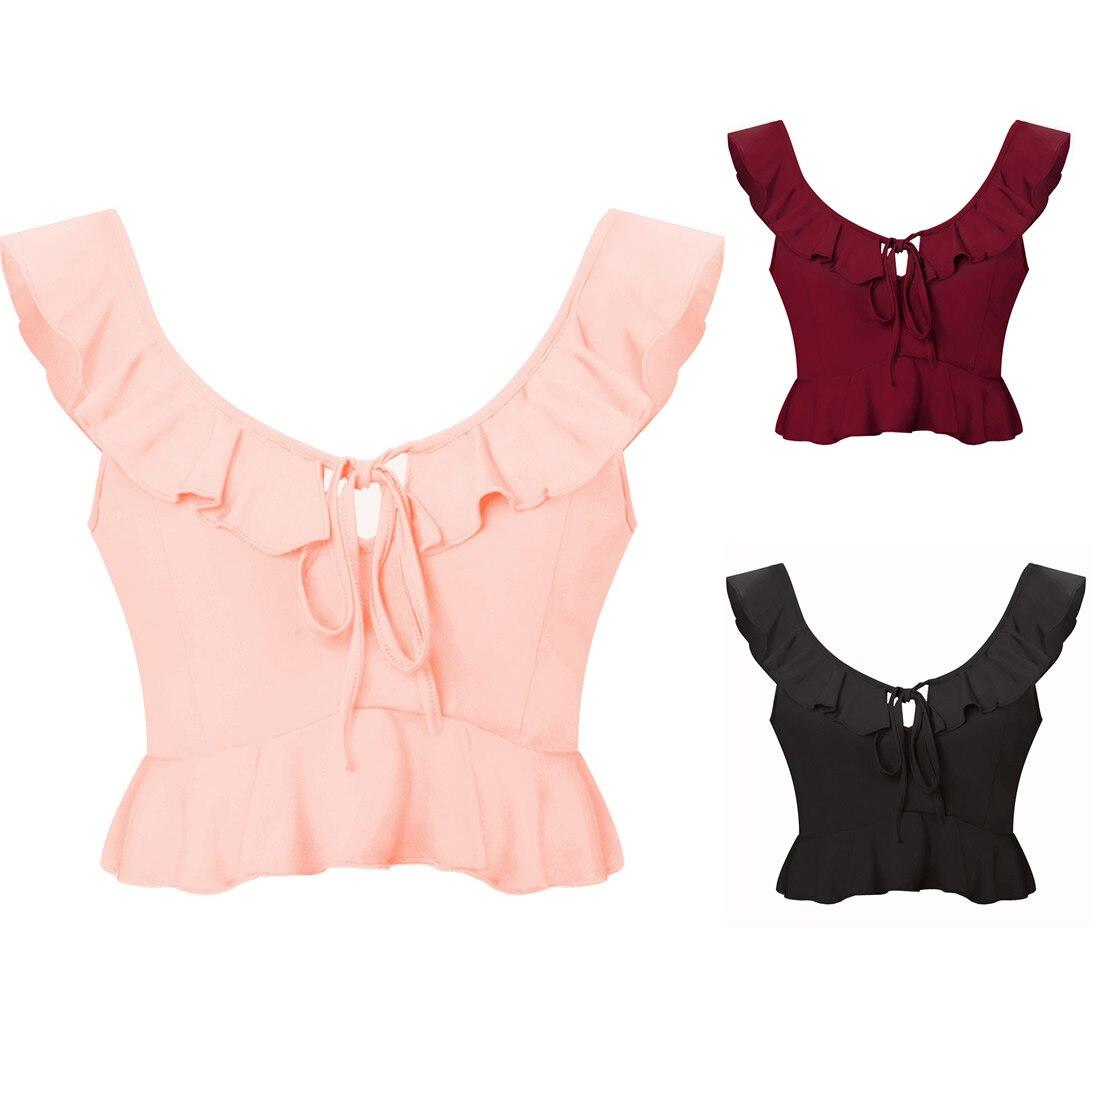 Mini Tops Boho-Crop-Top T-Shirt Backless Fashion Summer Women Sleeveless Sexy Casual